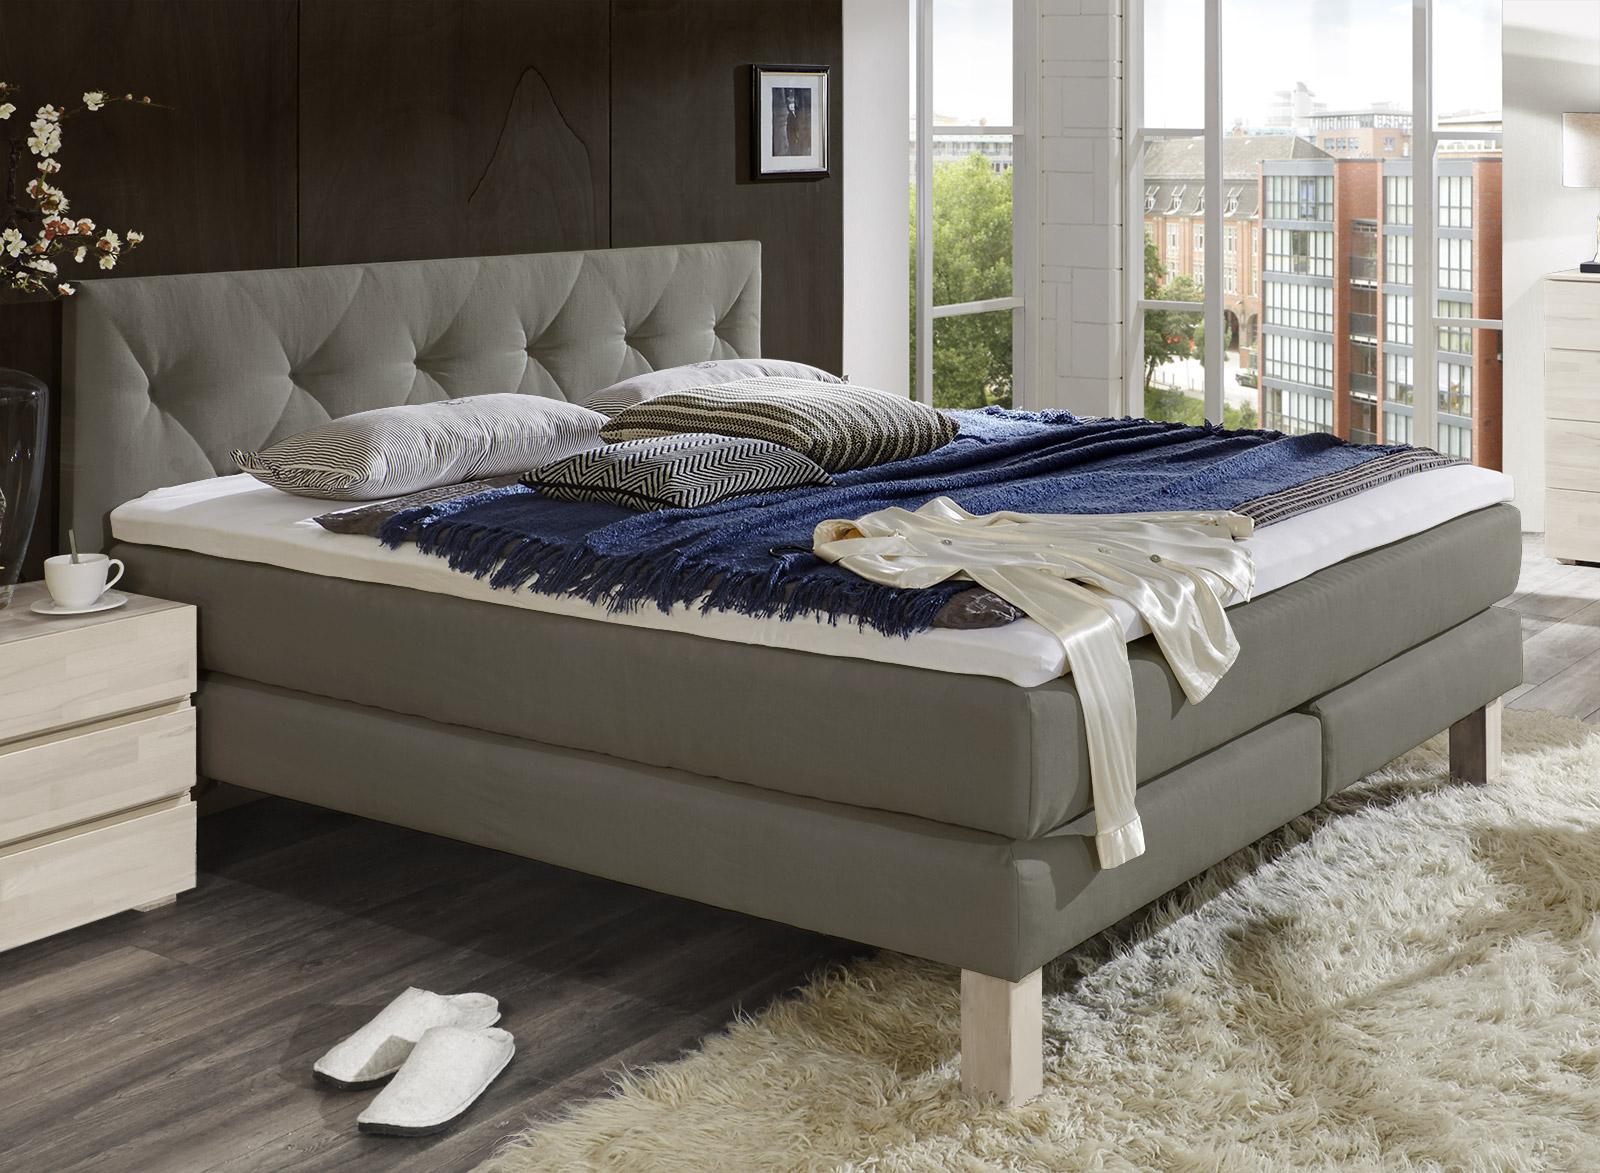 boxspringbett in romantisch verspieltem design cantabria. Black Bedroom Furniture Sets. Home Design Ideas